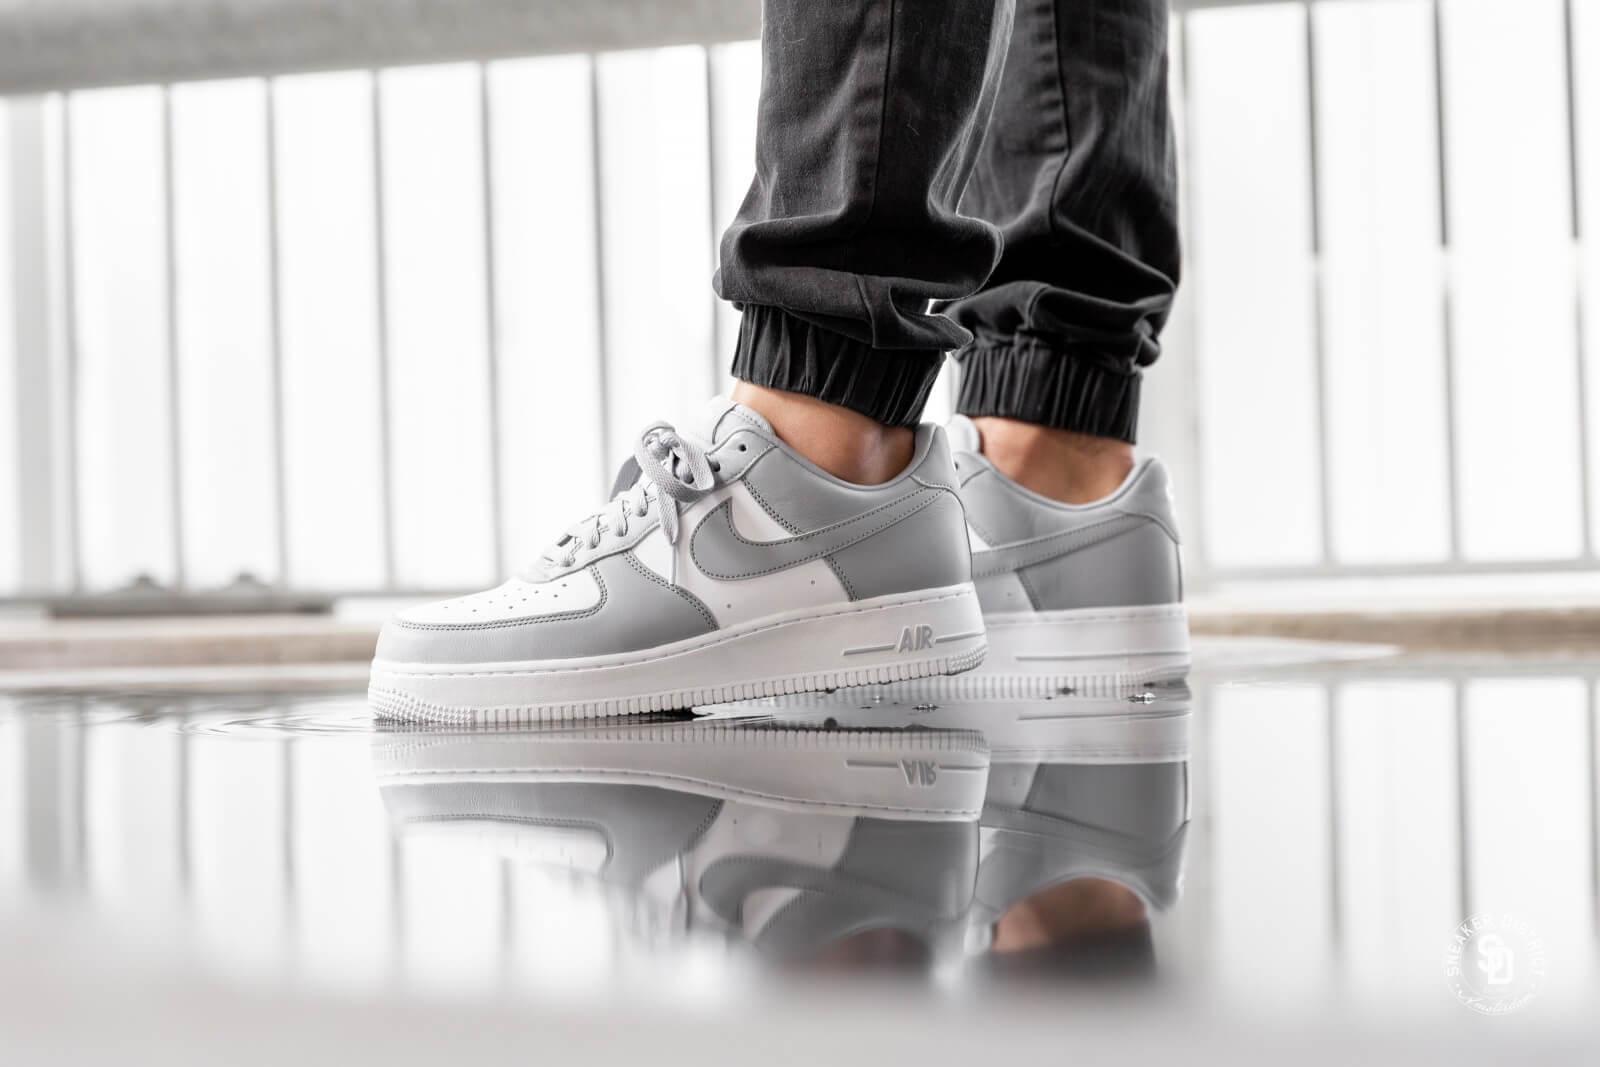 Nike Air Force 1 LO WhiteWolf Grey AQ4134 101